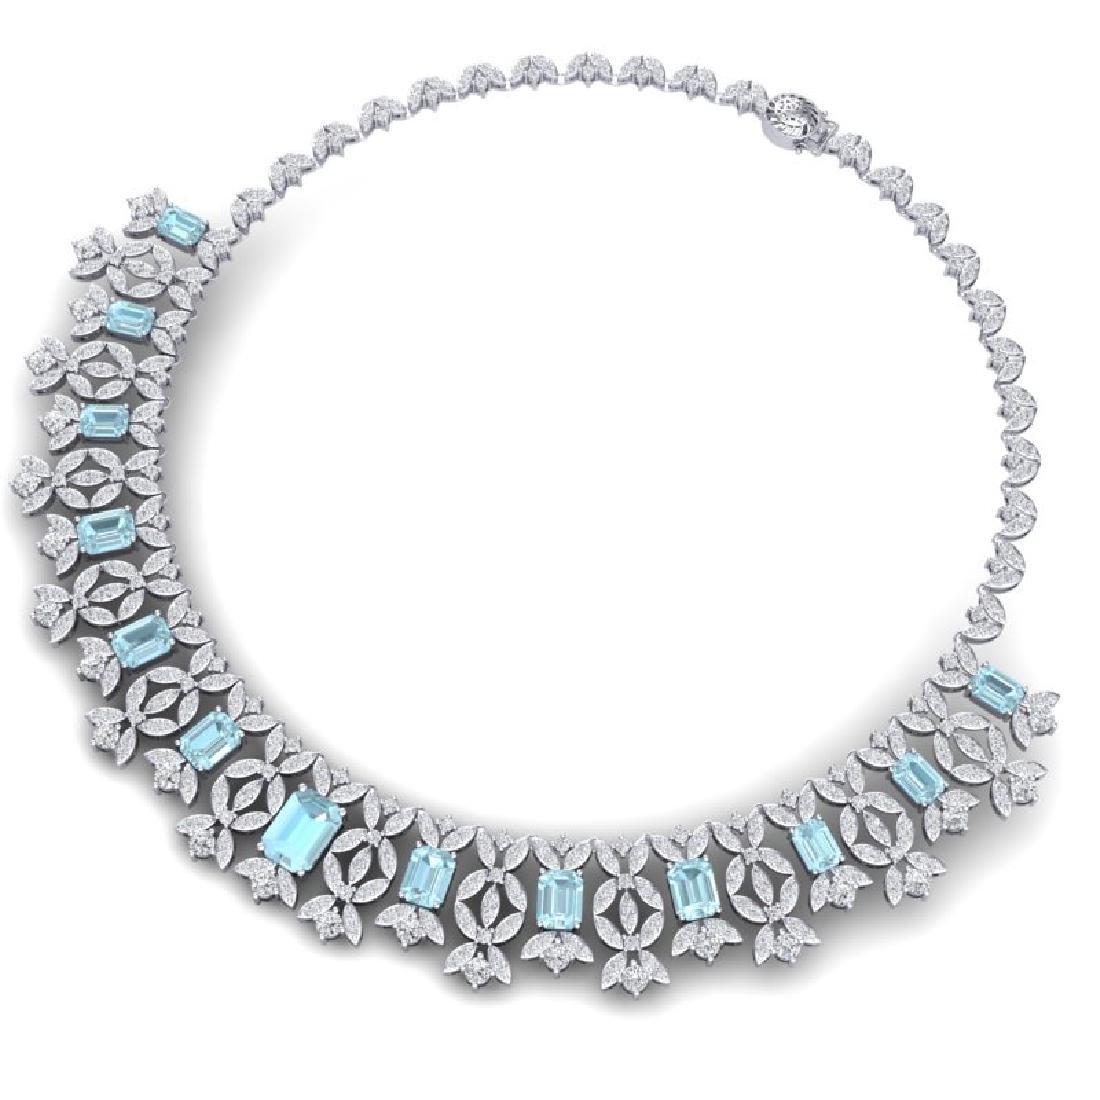 53.14 CTW Royalty Sky Topaz & VS Diamond Necklace 18K - 3